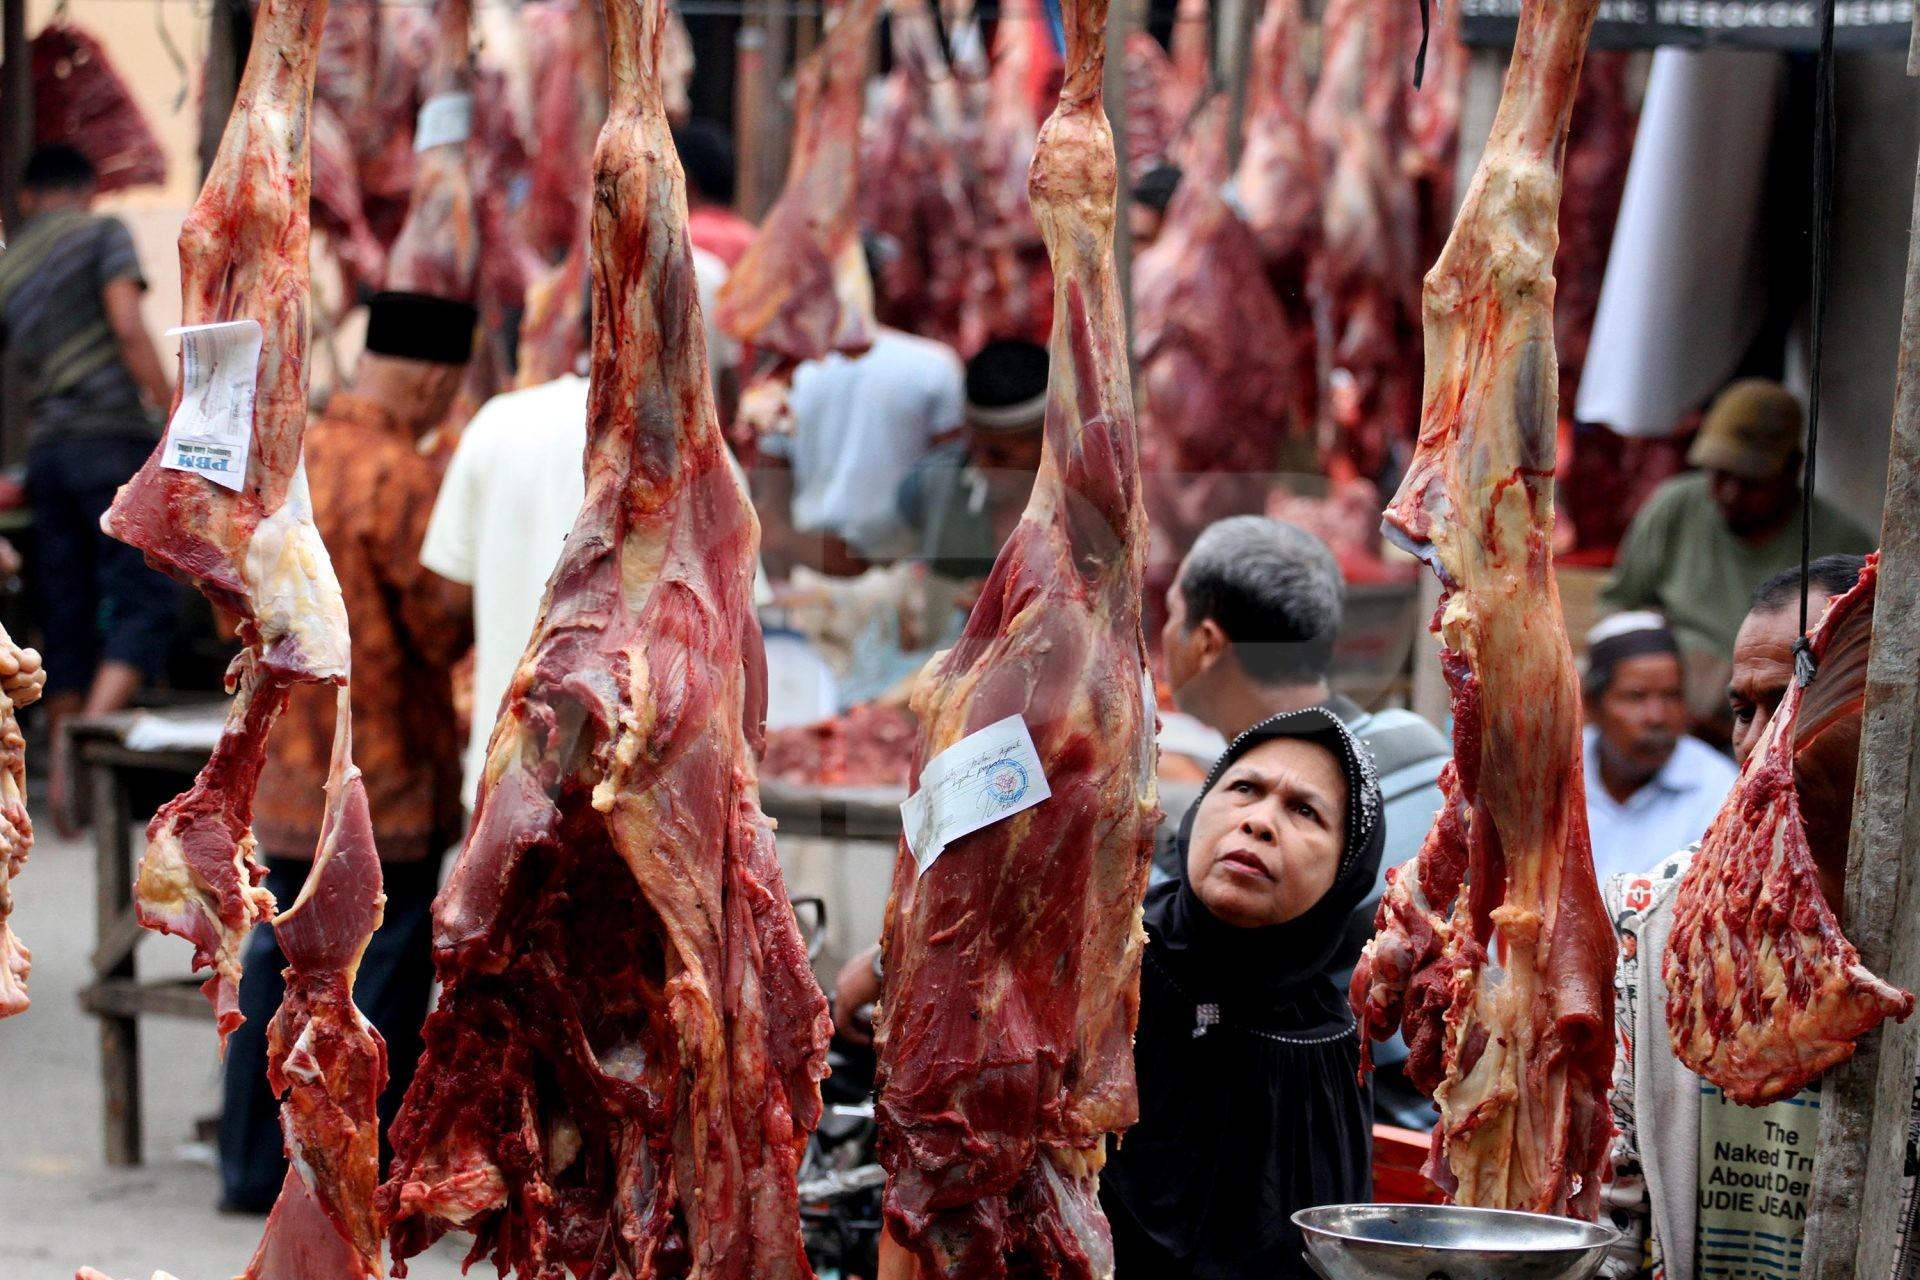 Deretan daging yang dijual di pasar | Foto: acehpressphoto.com